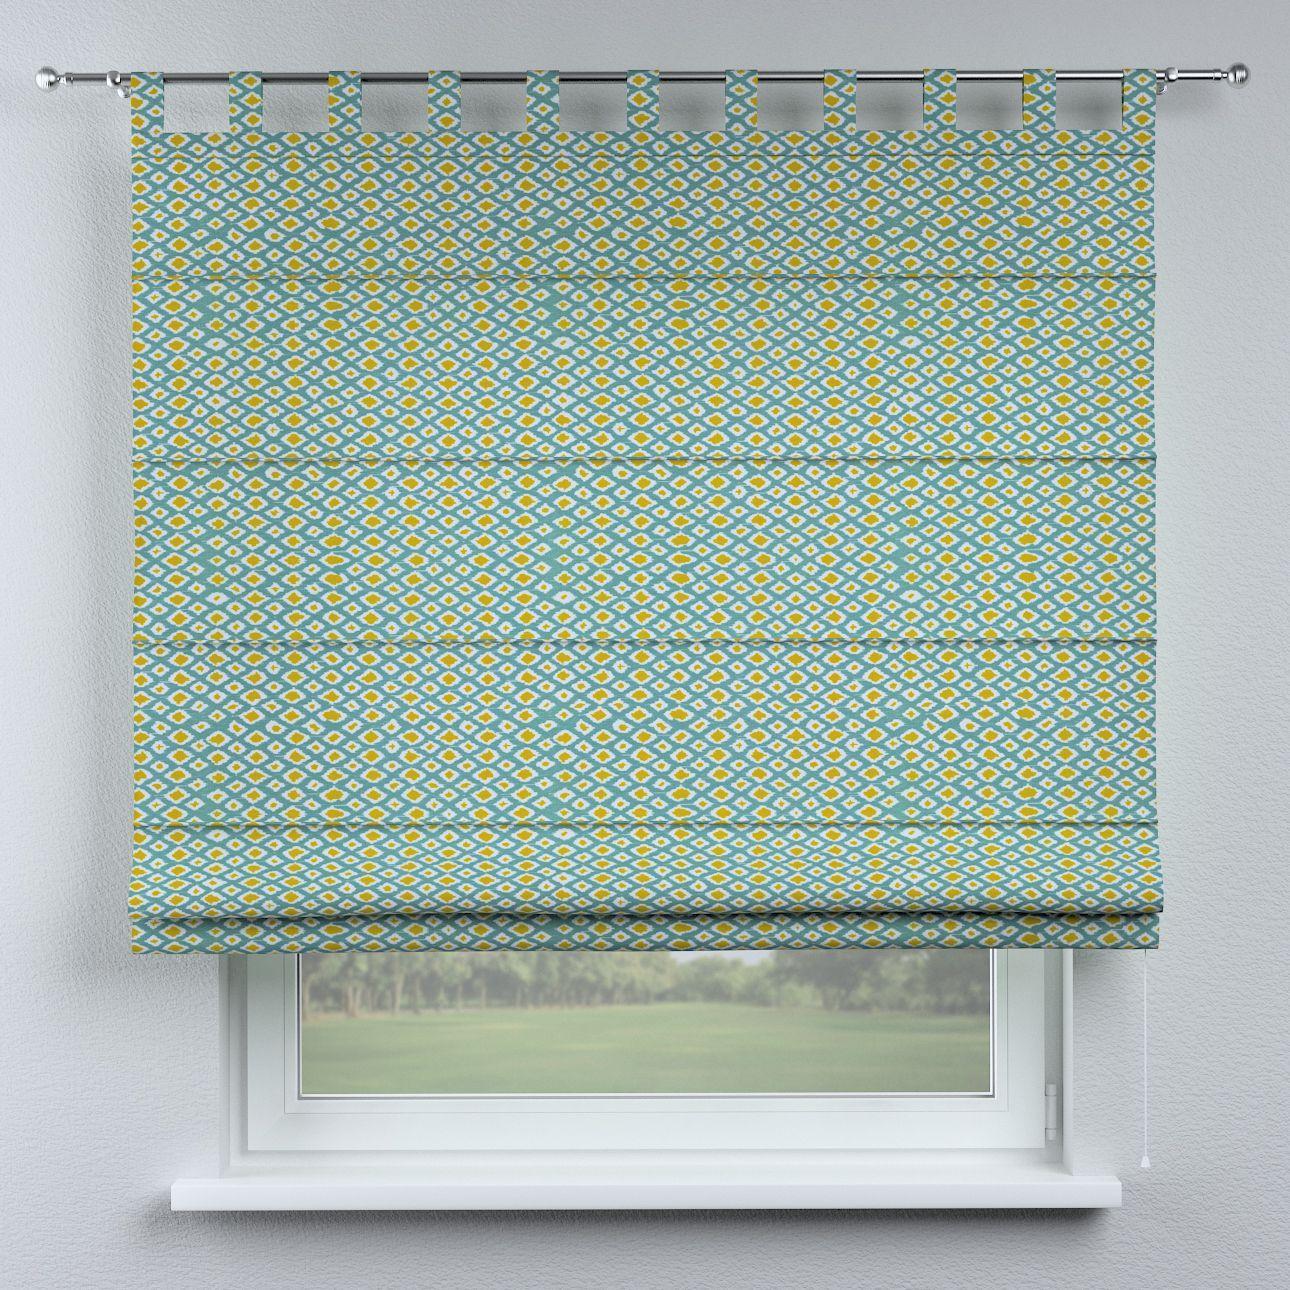 Verdunkelungsrollo Fenster Innen Matchline Plissee Rollo